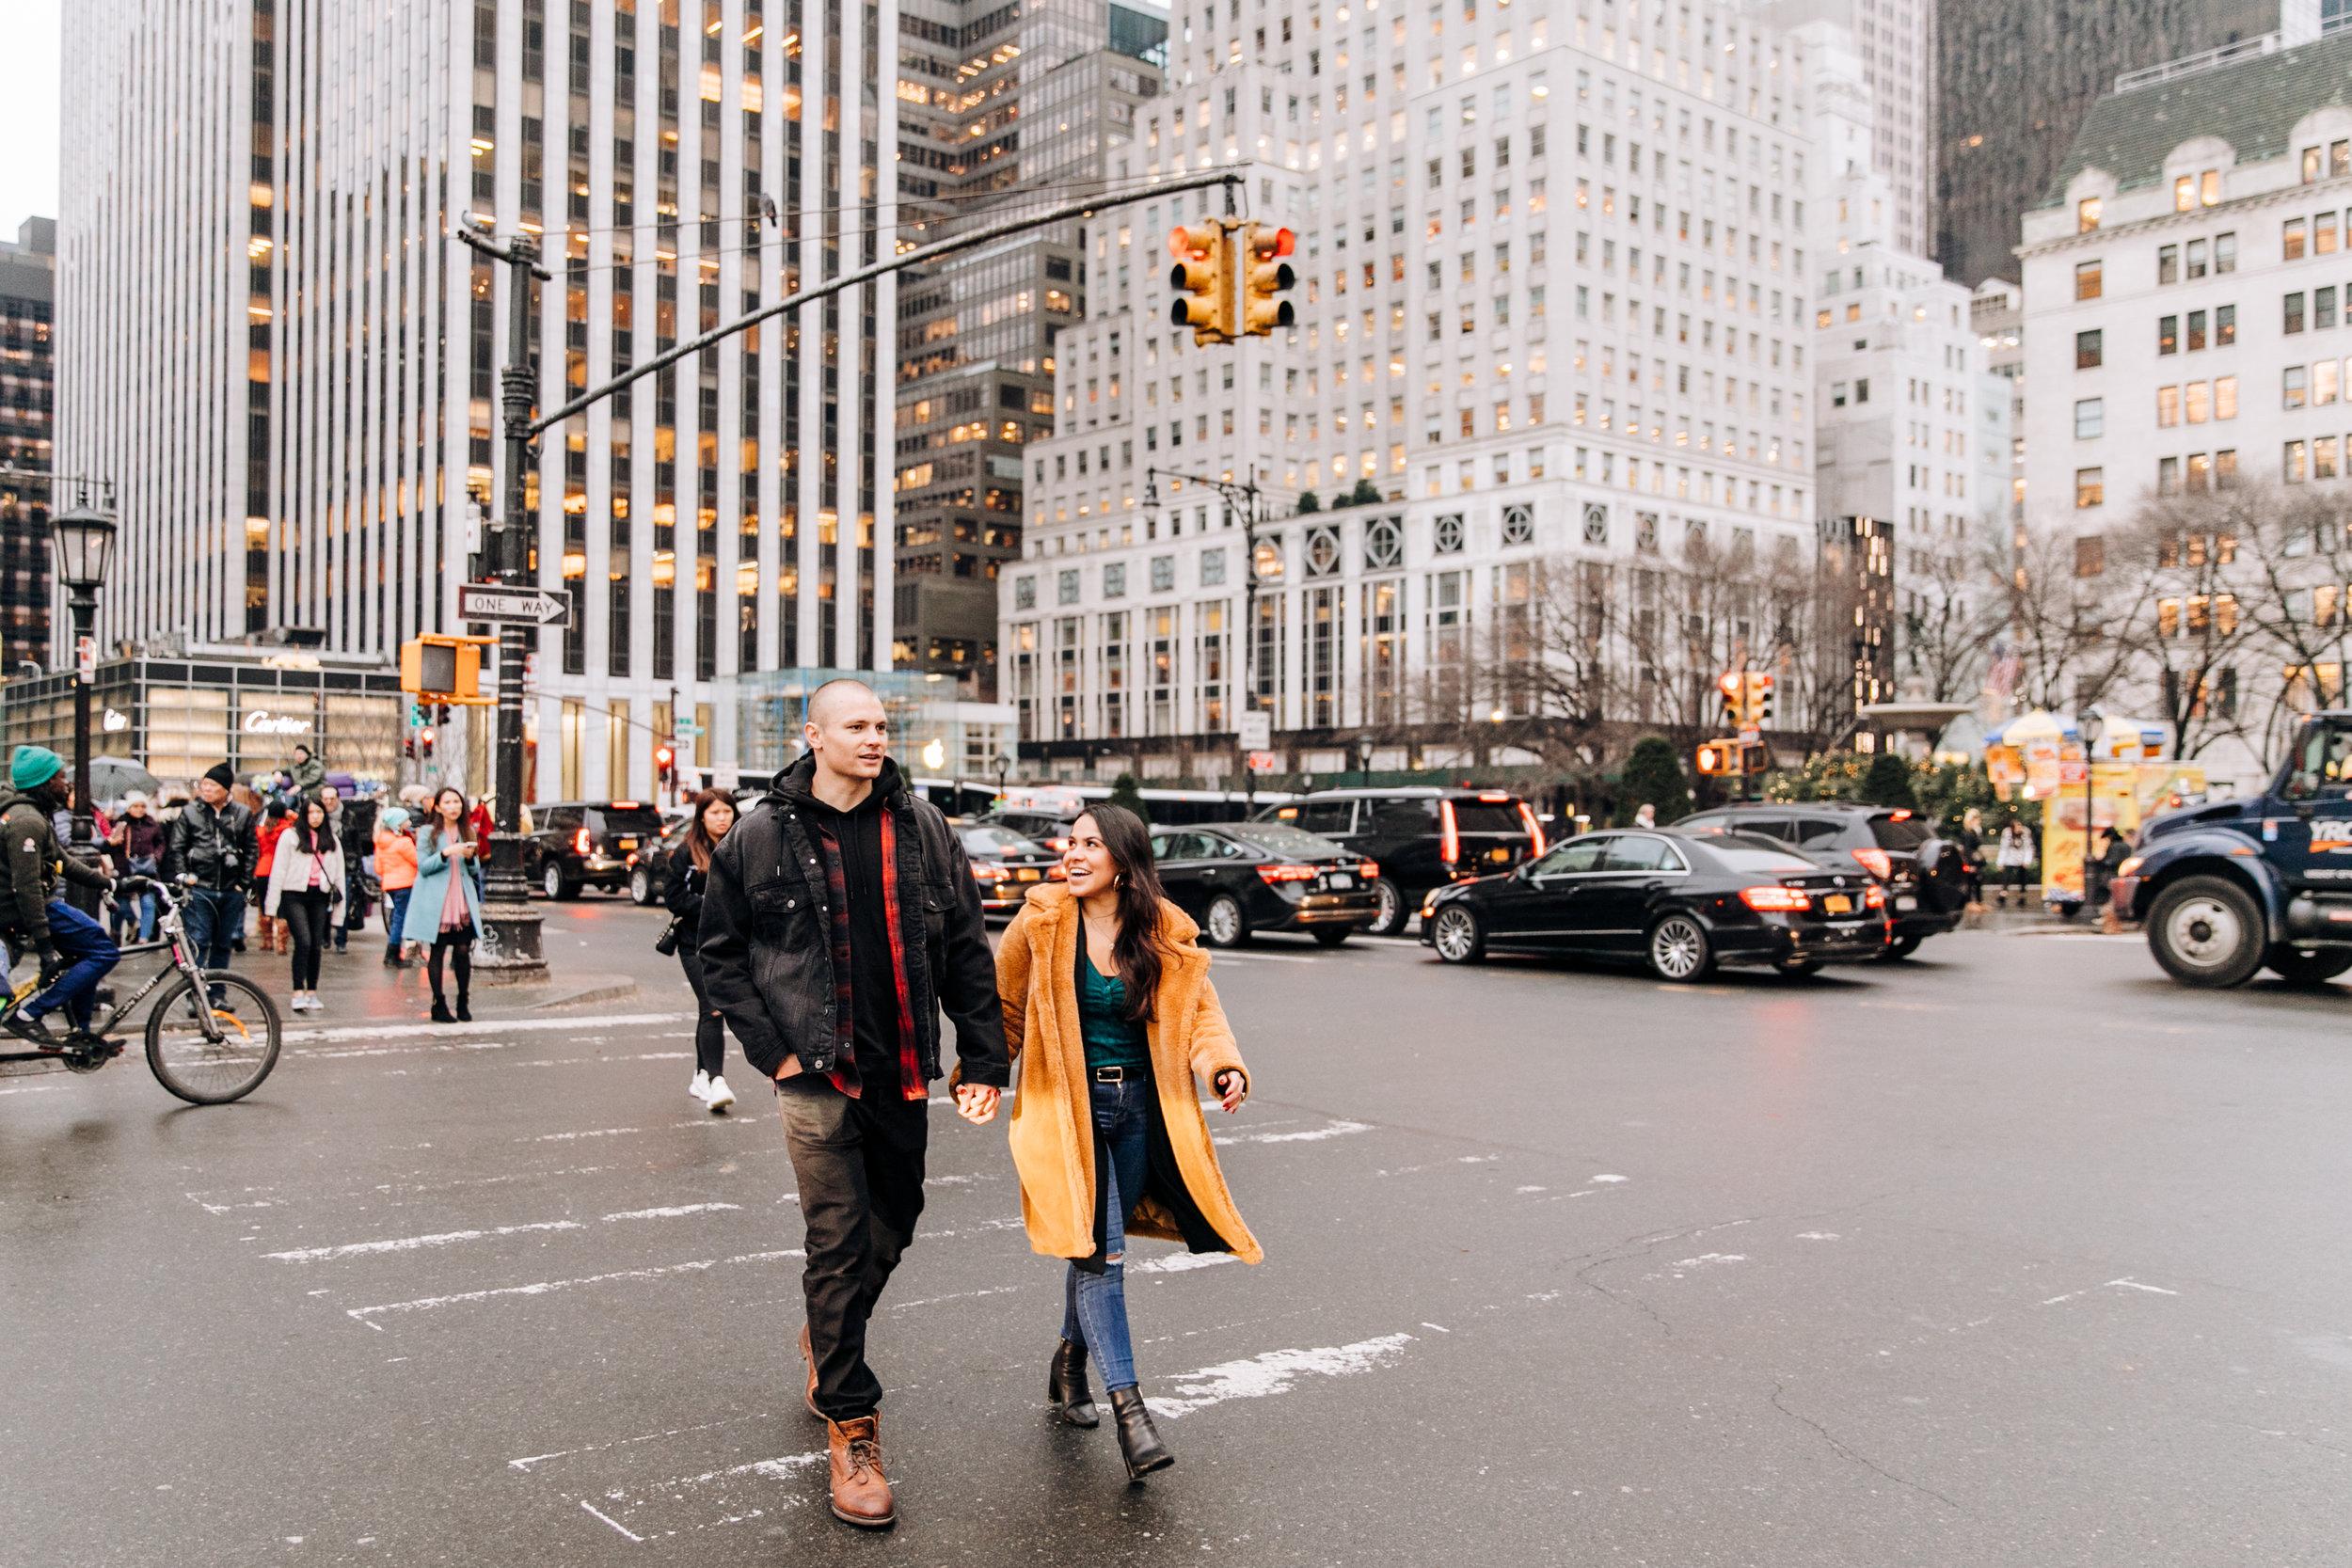 New York City Proposal, Central Park Proposal, NY Proposal Photographer, New York Proposal Photographer, NYC Engagement Photographer, New York Engagement Session, Central Park Proposal Photographer